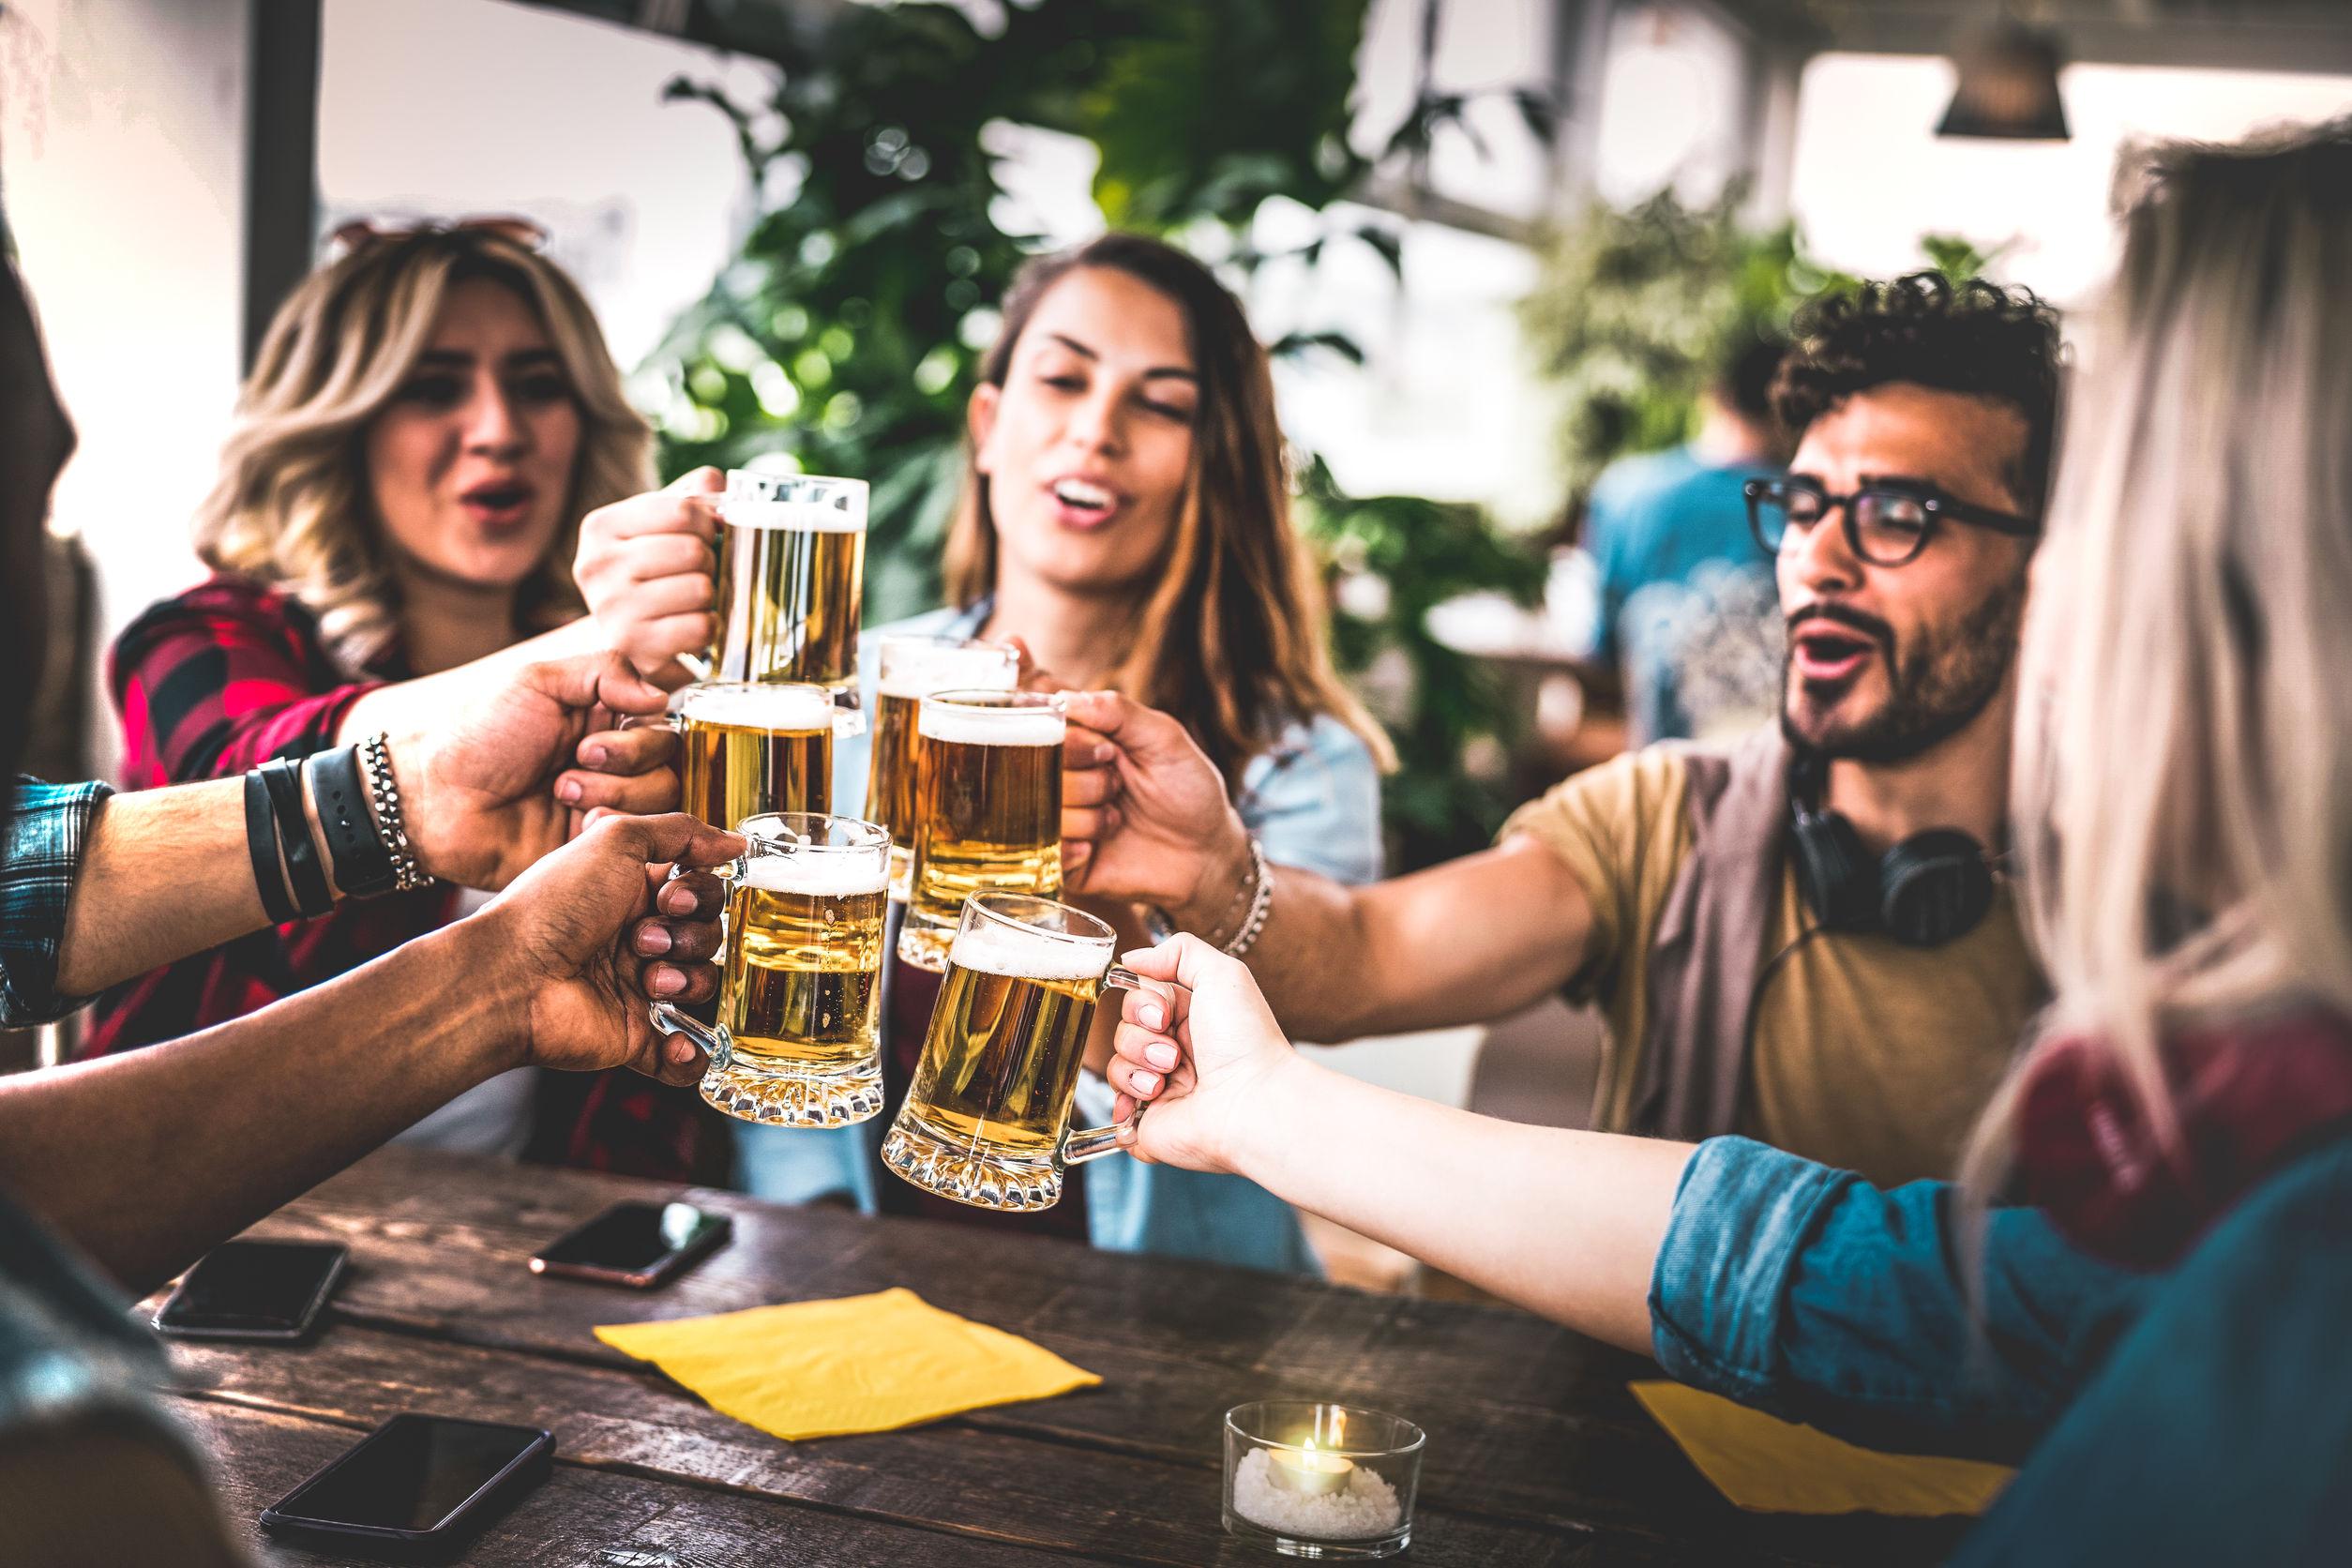 Amis terrasse bière